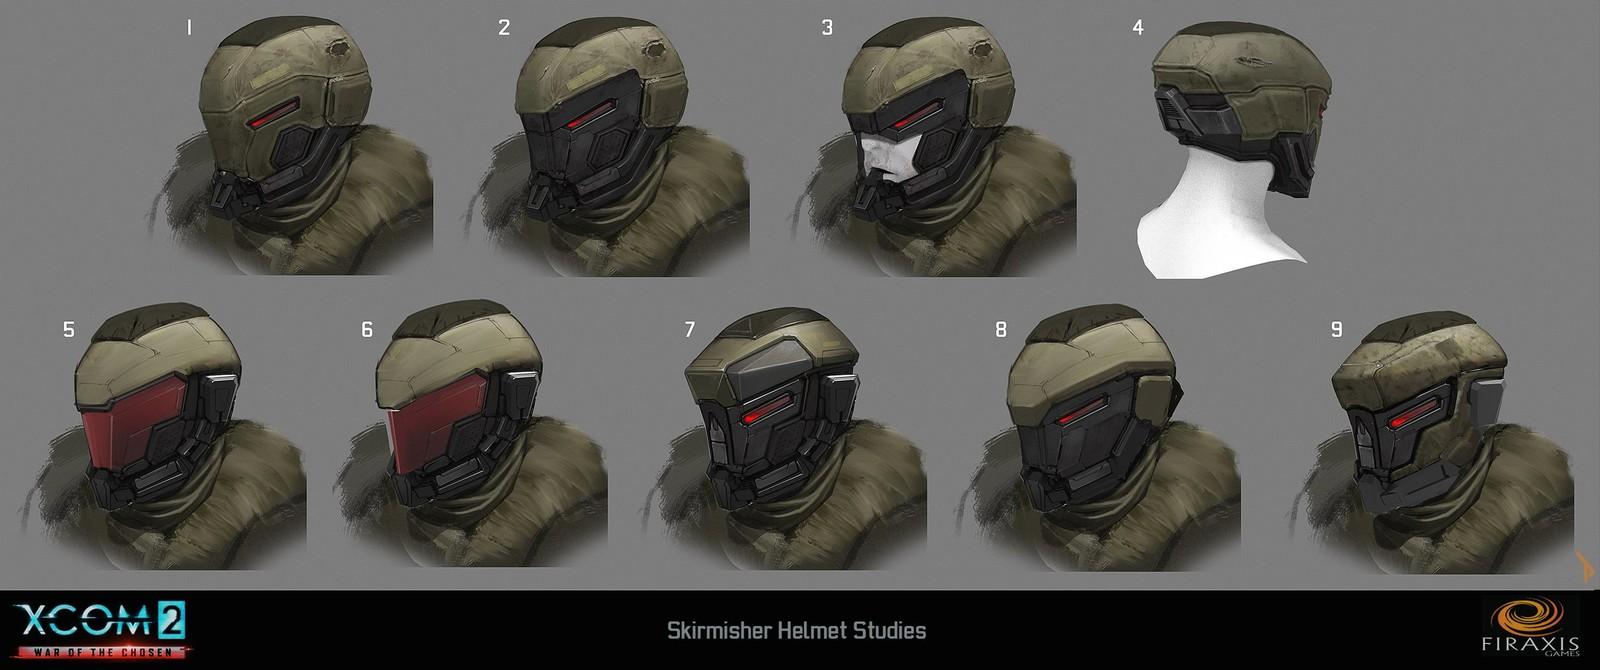 Skirmisher helmet variations